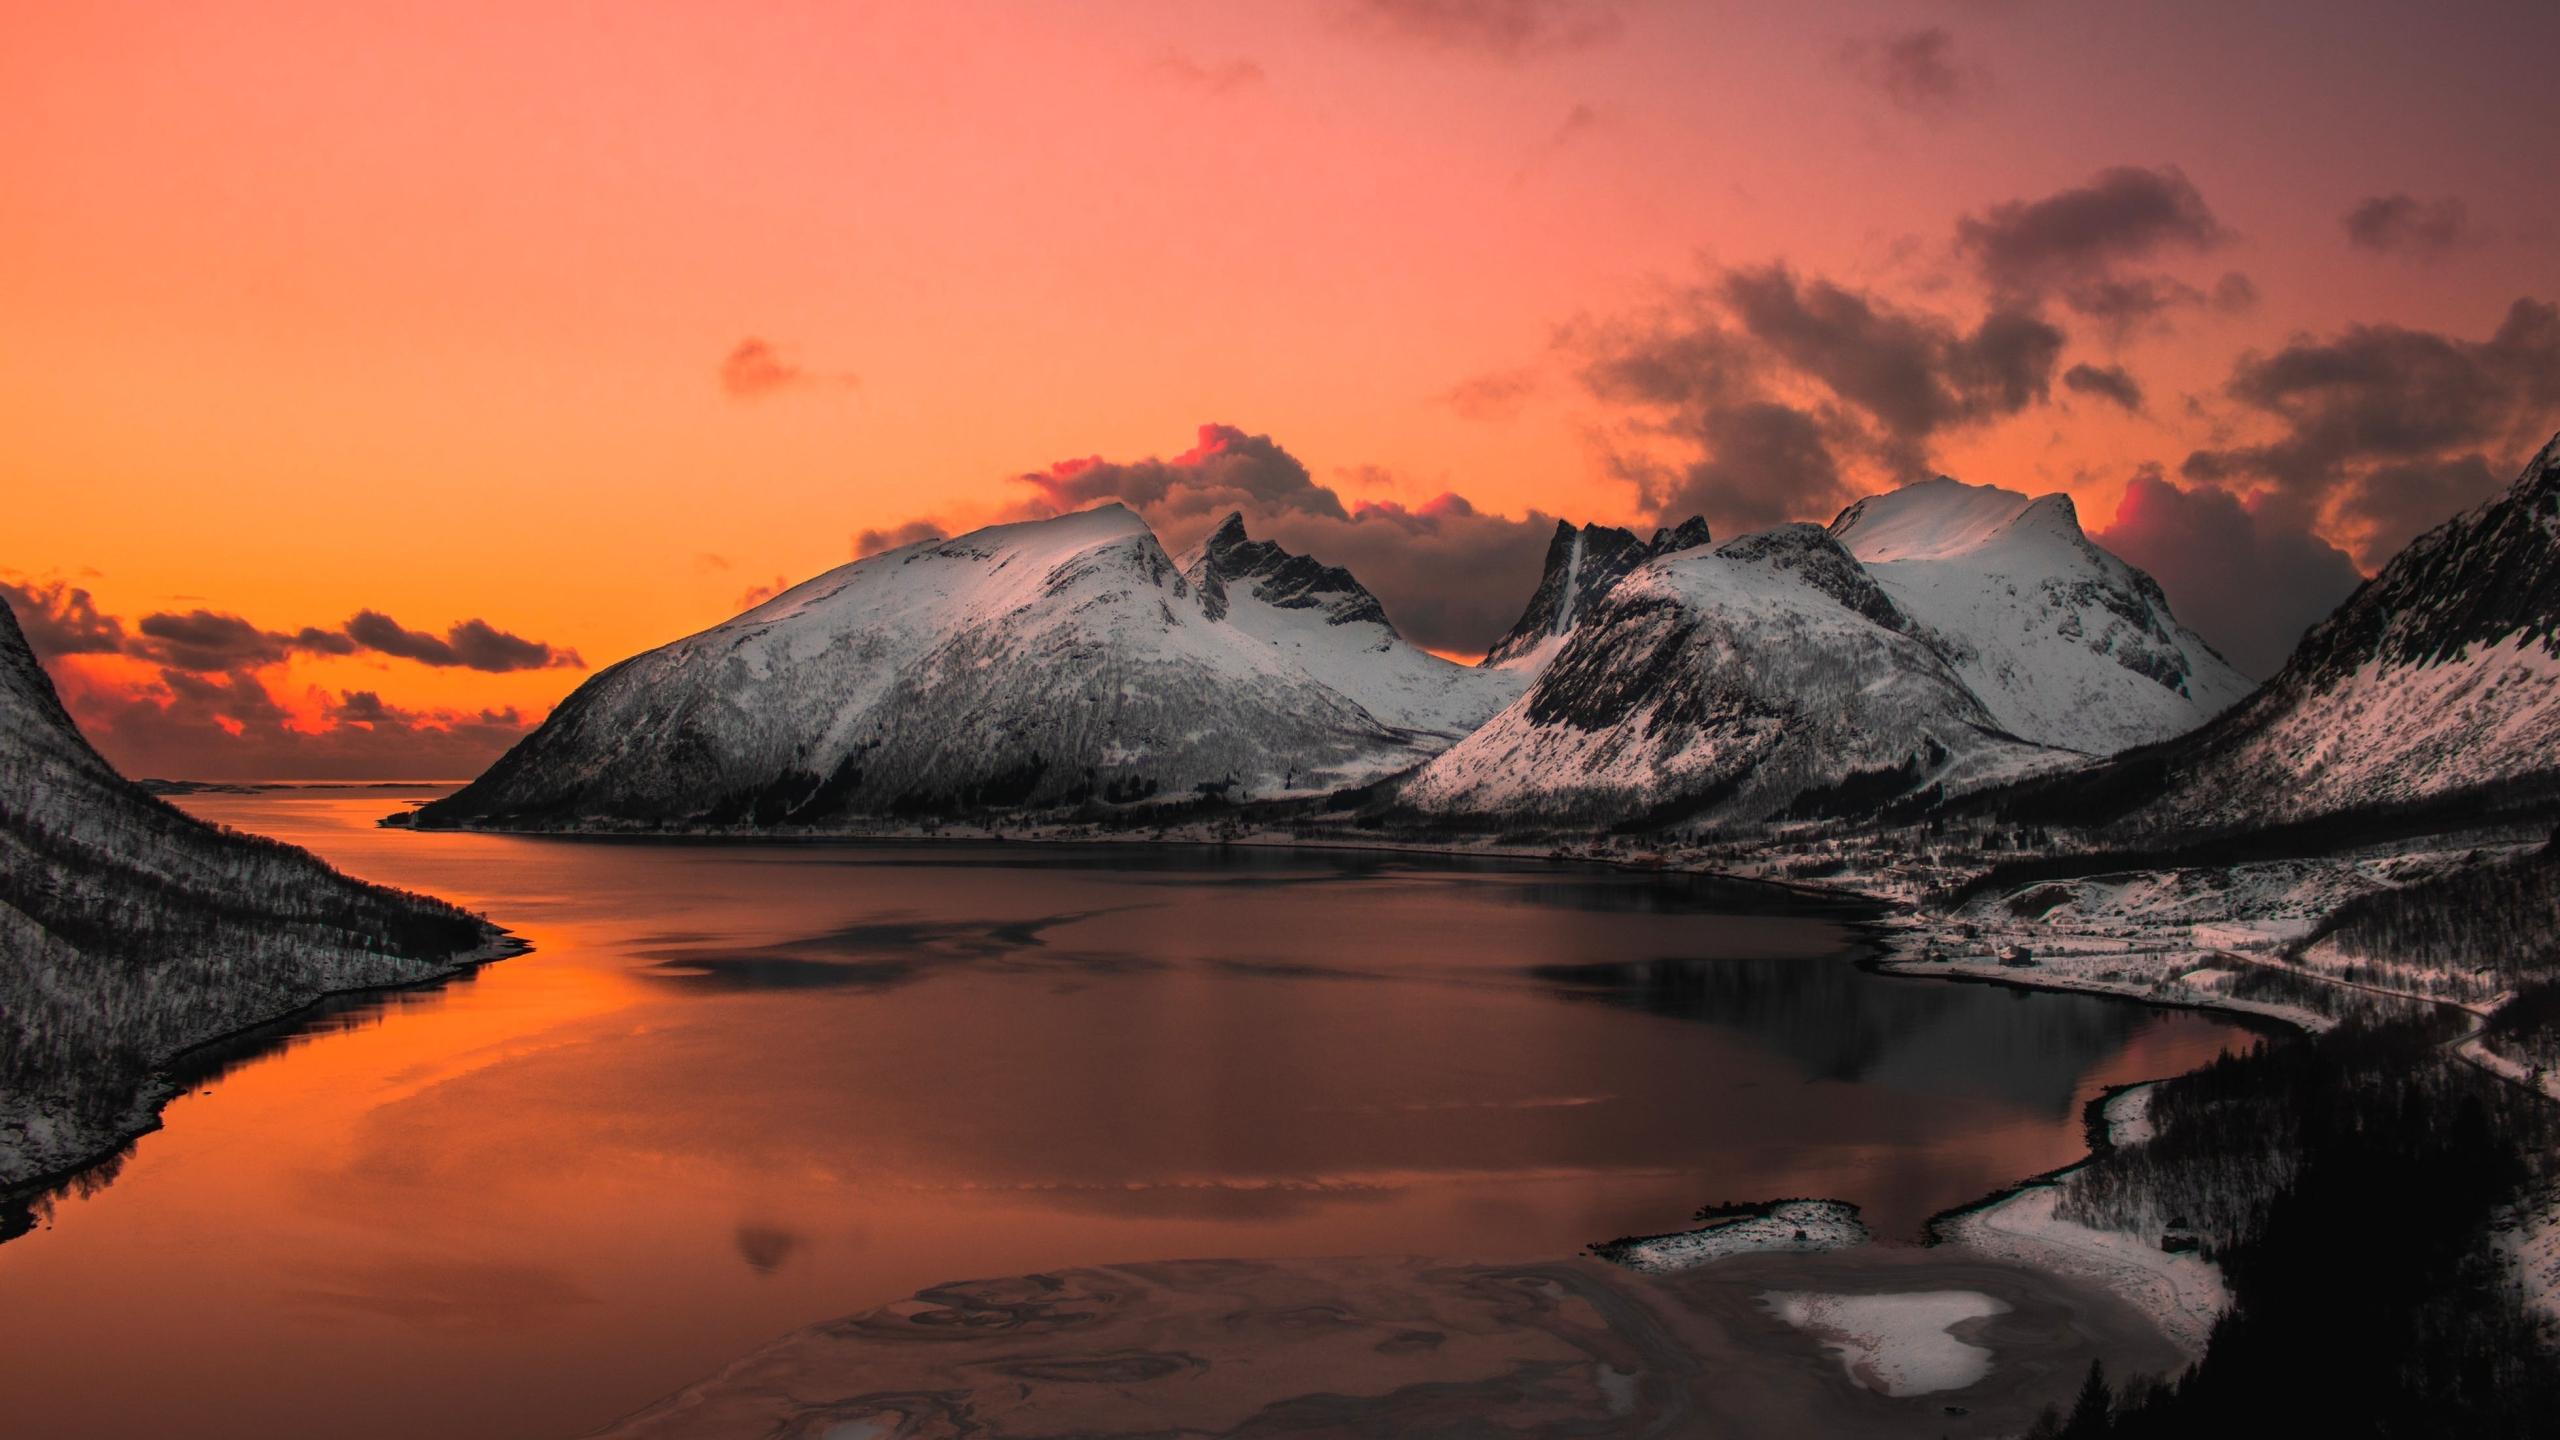 2560x1440 Surreal Mountain Landscape Lake 4k 1440p